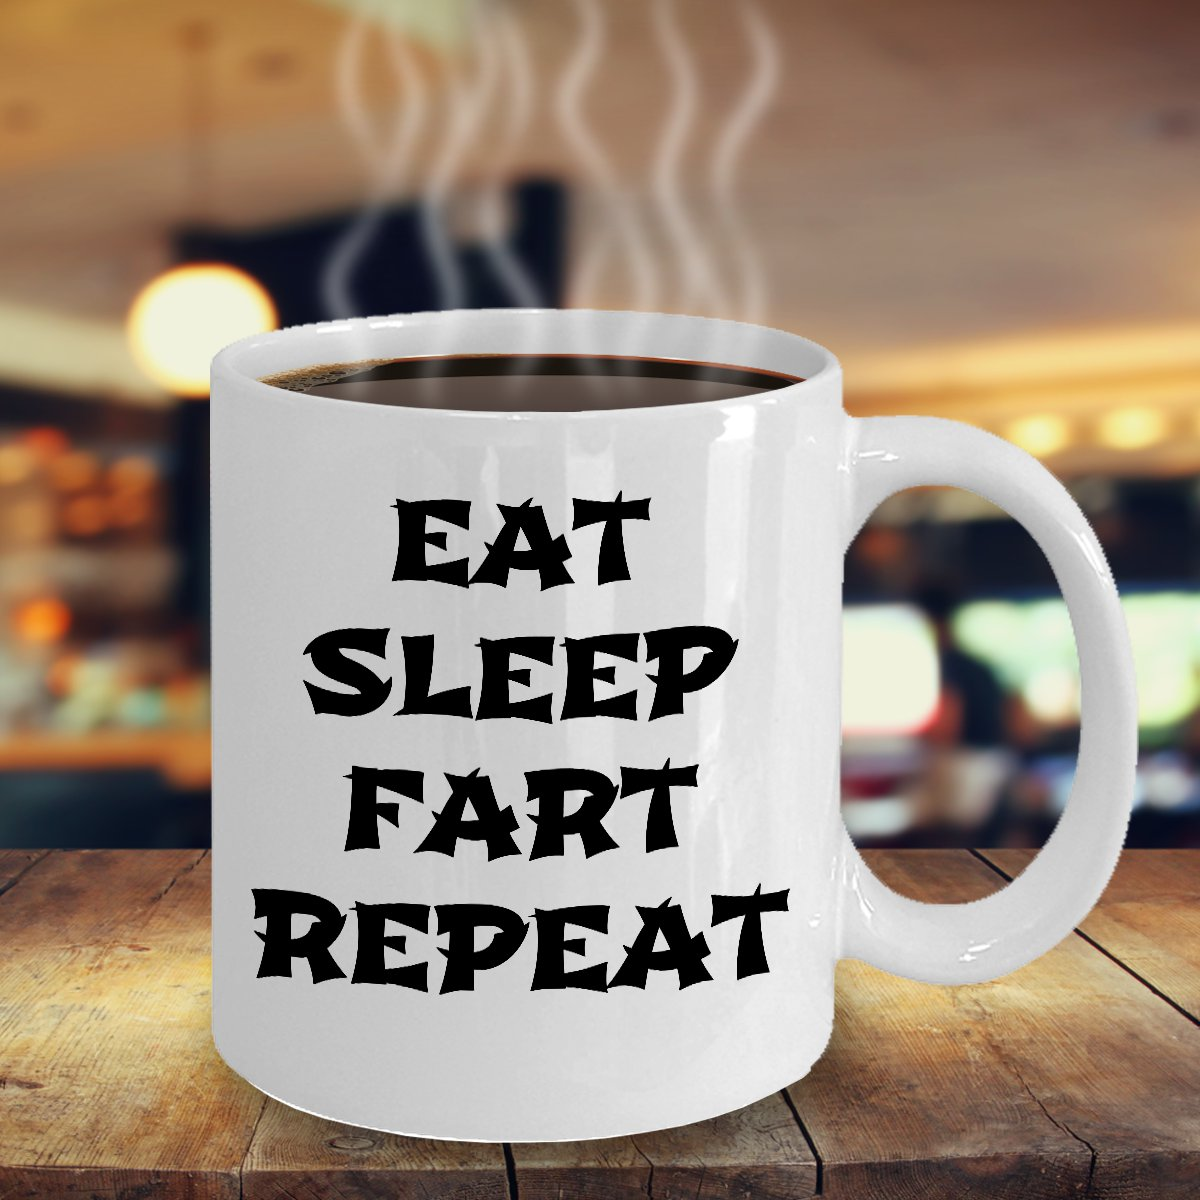 Funny EAT SLEEP FART REPEATMug 11OZCeramic Novelty Coffee-Tea-Cup